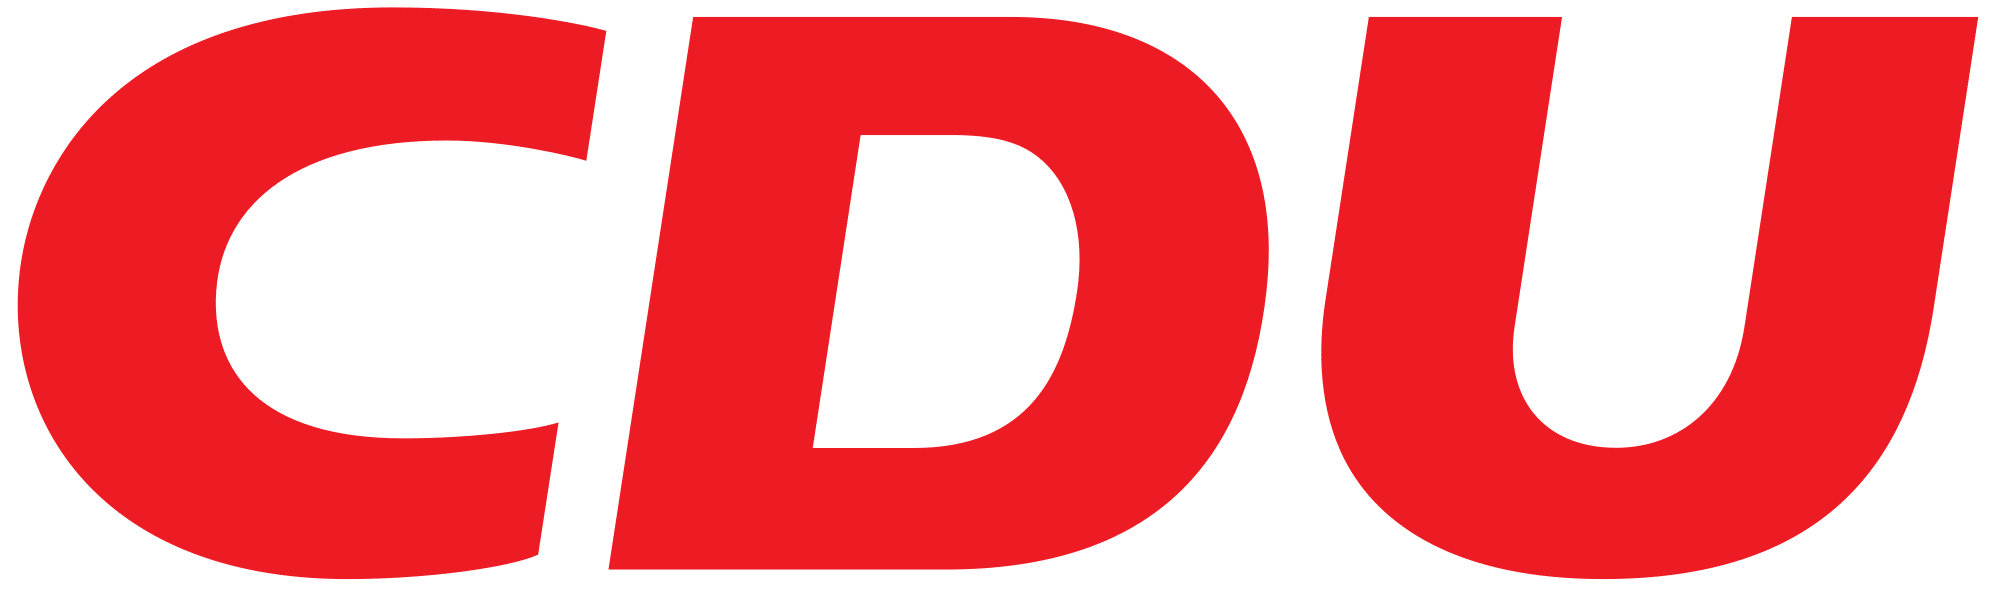 CDU - Logo